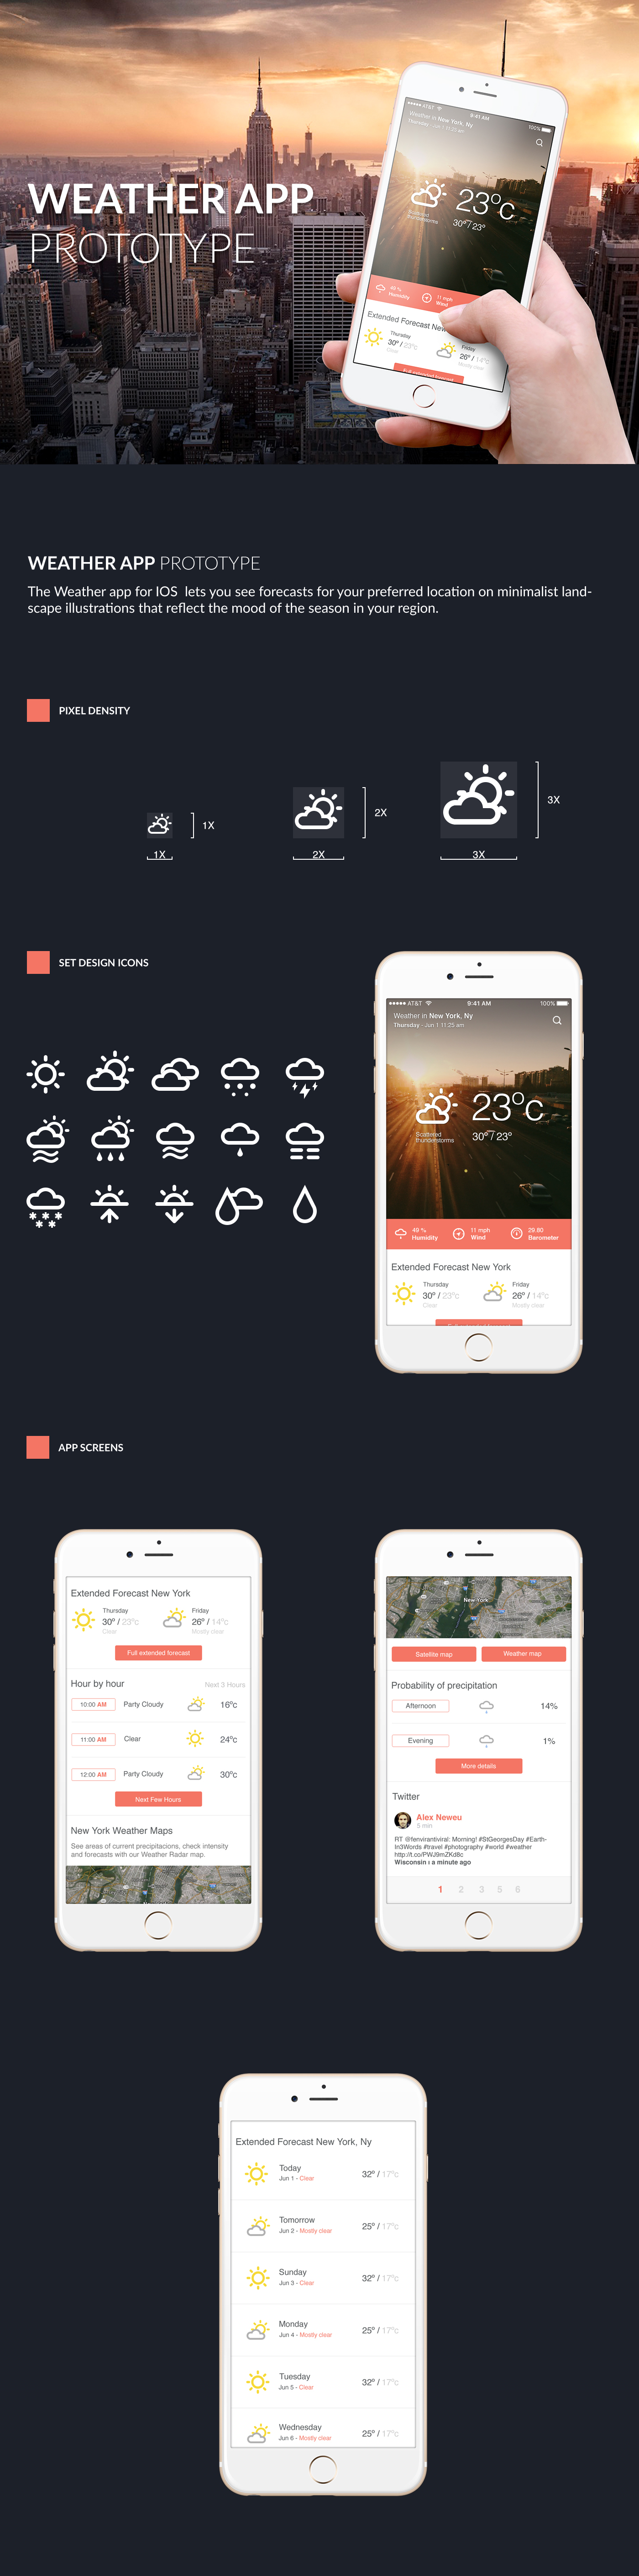 uxdesign uidesign weather mobileapp